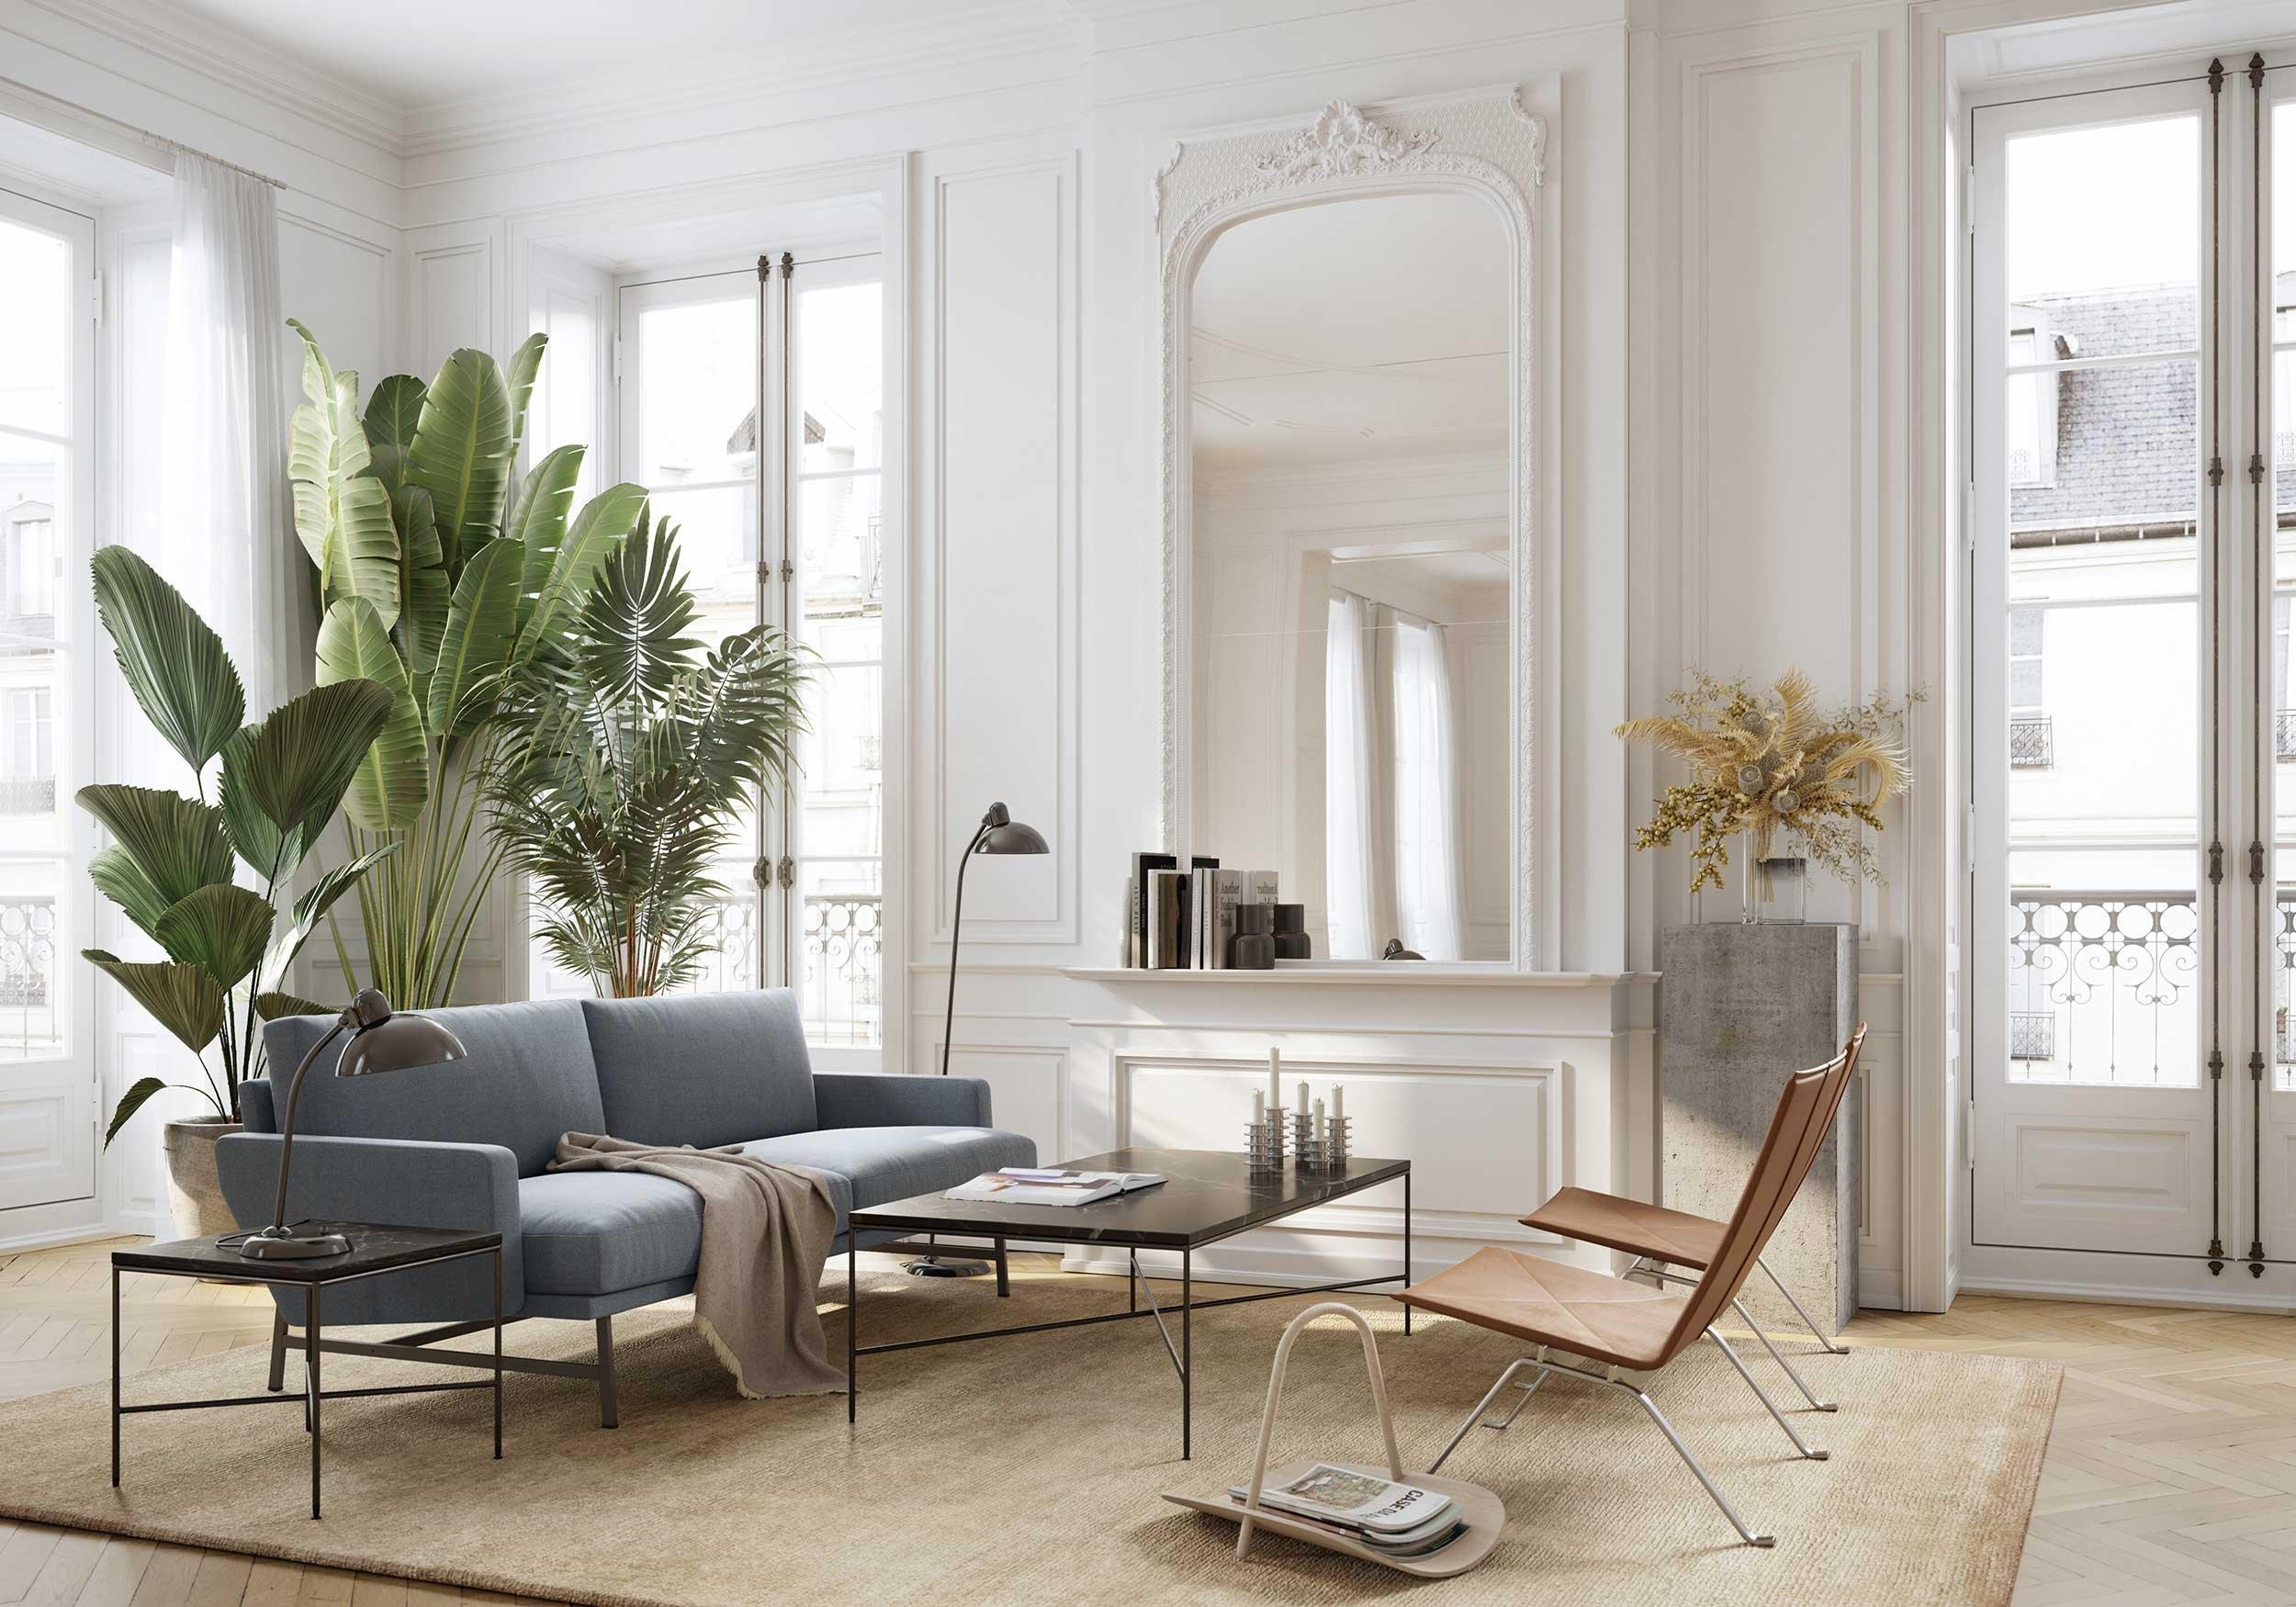 10924_Fritz_Hansen_French_Apartment_Angle 1